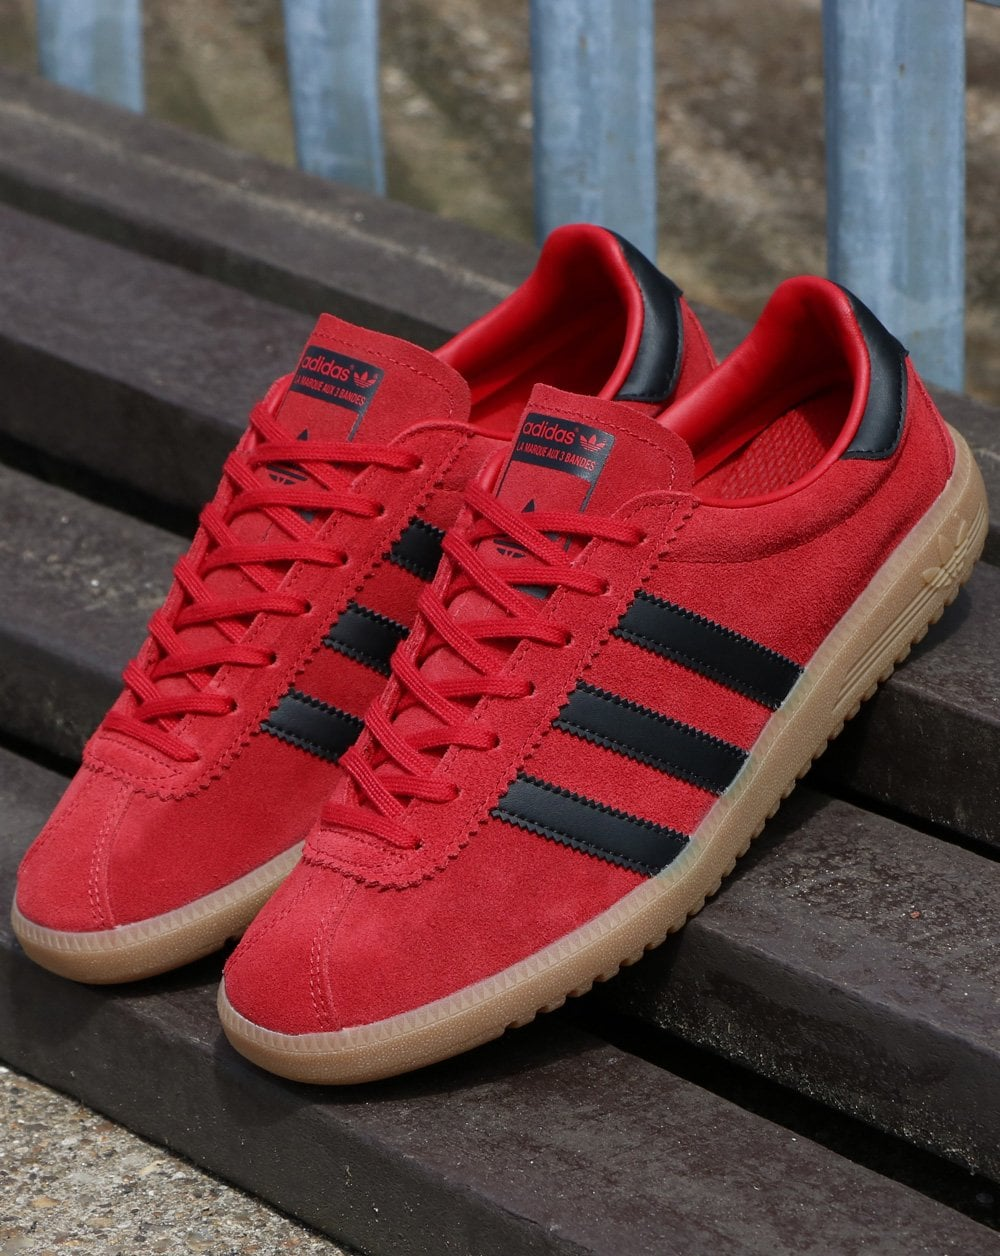 59c7c03e5cee7d adidas Trainers Adidas Bermuda Trainers Red Black Gum